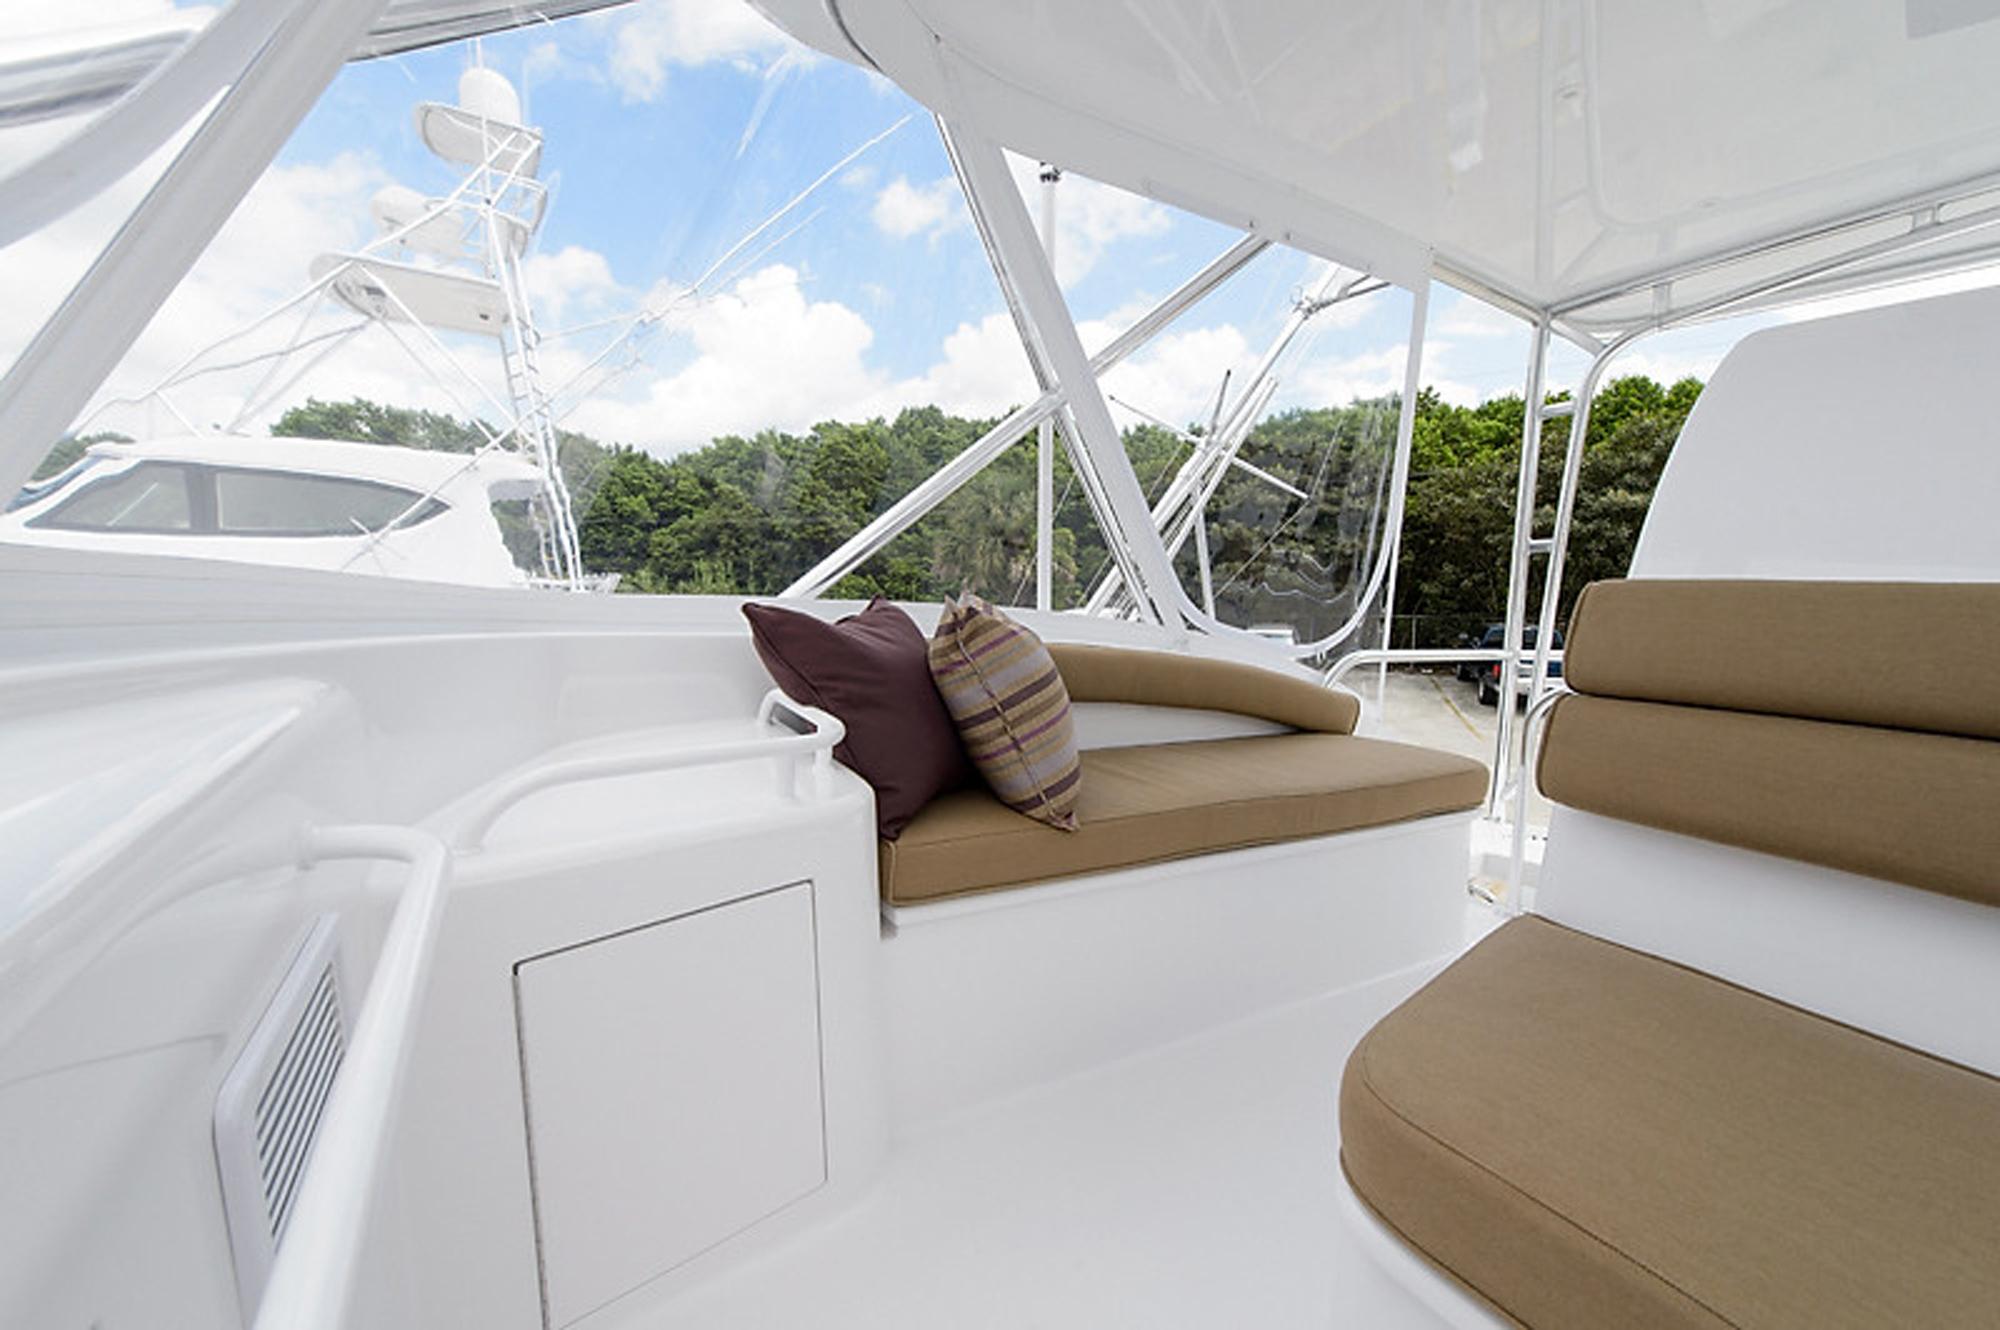 54 Ft Hatteras Motor Yacht